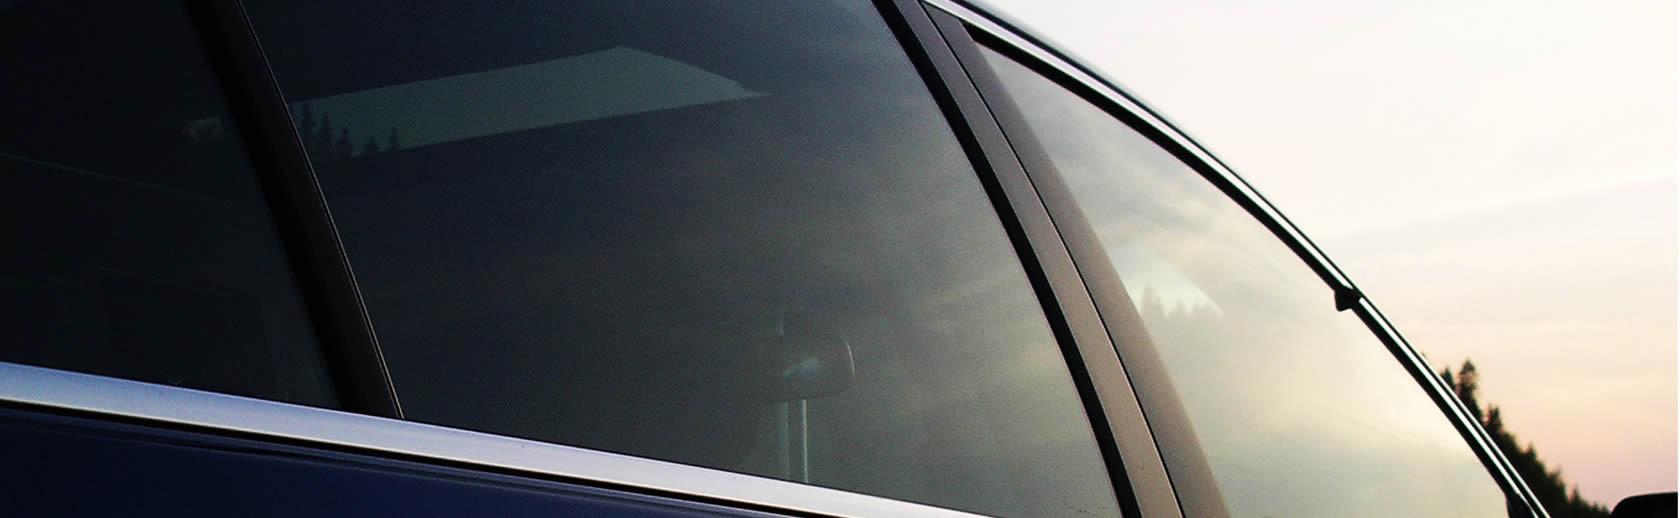 auto-glass-slde